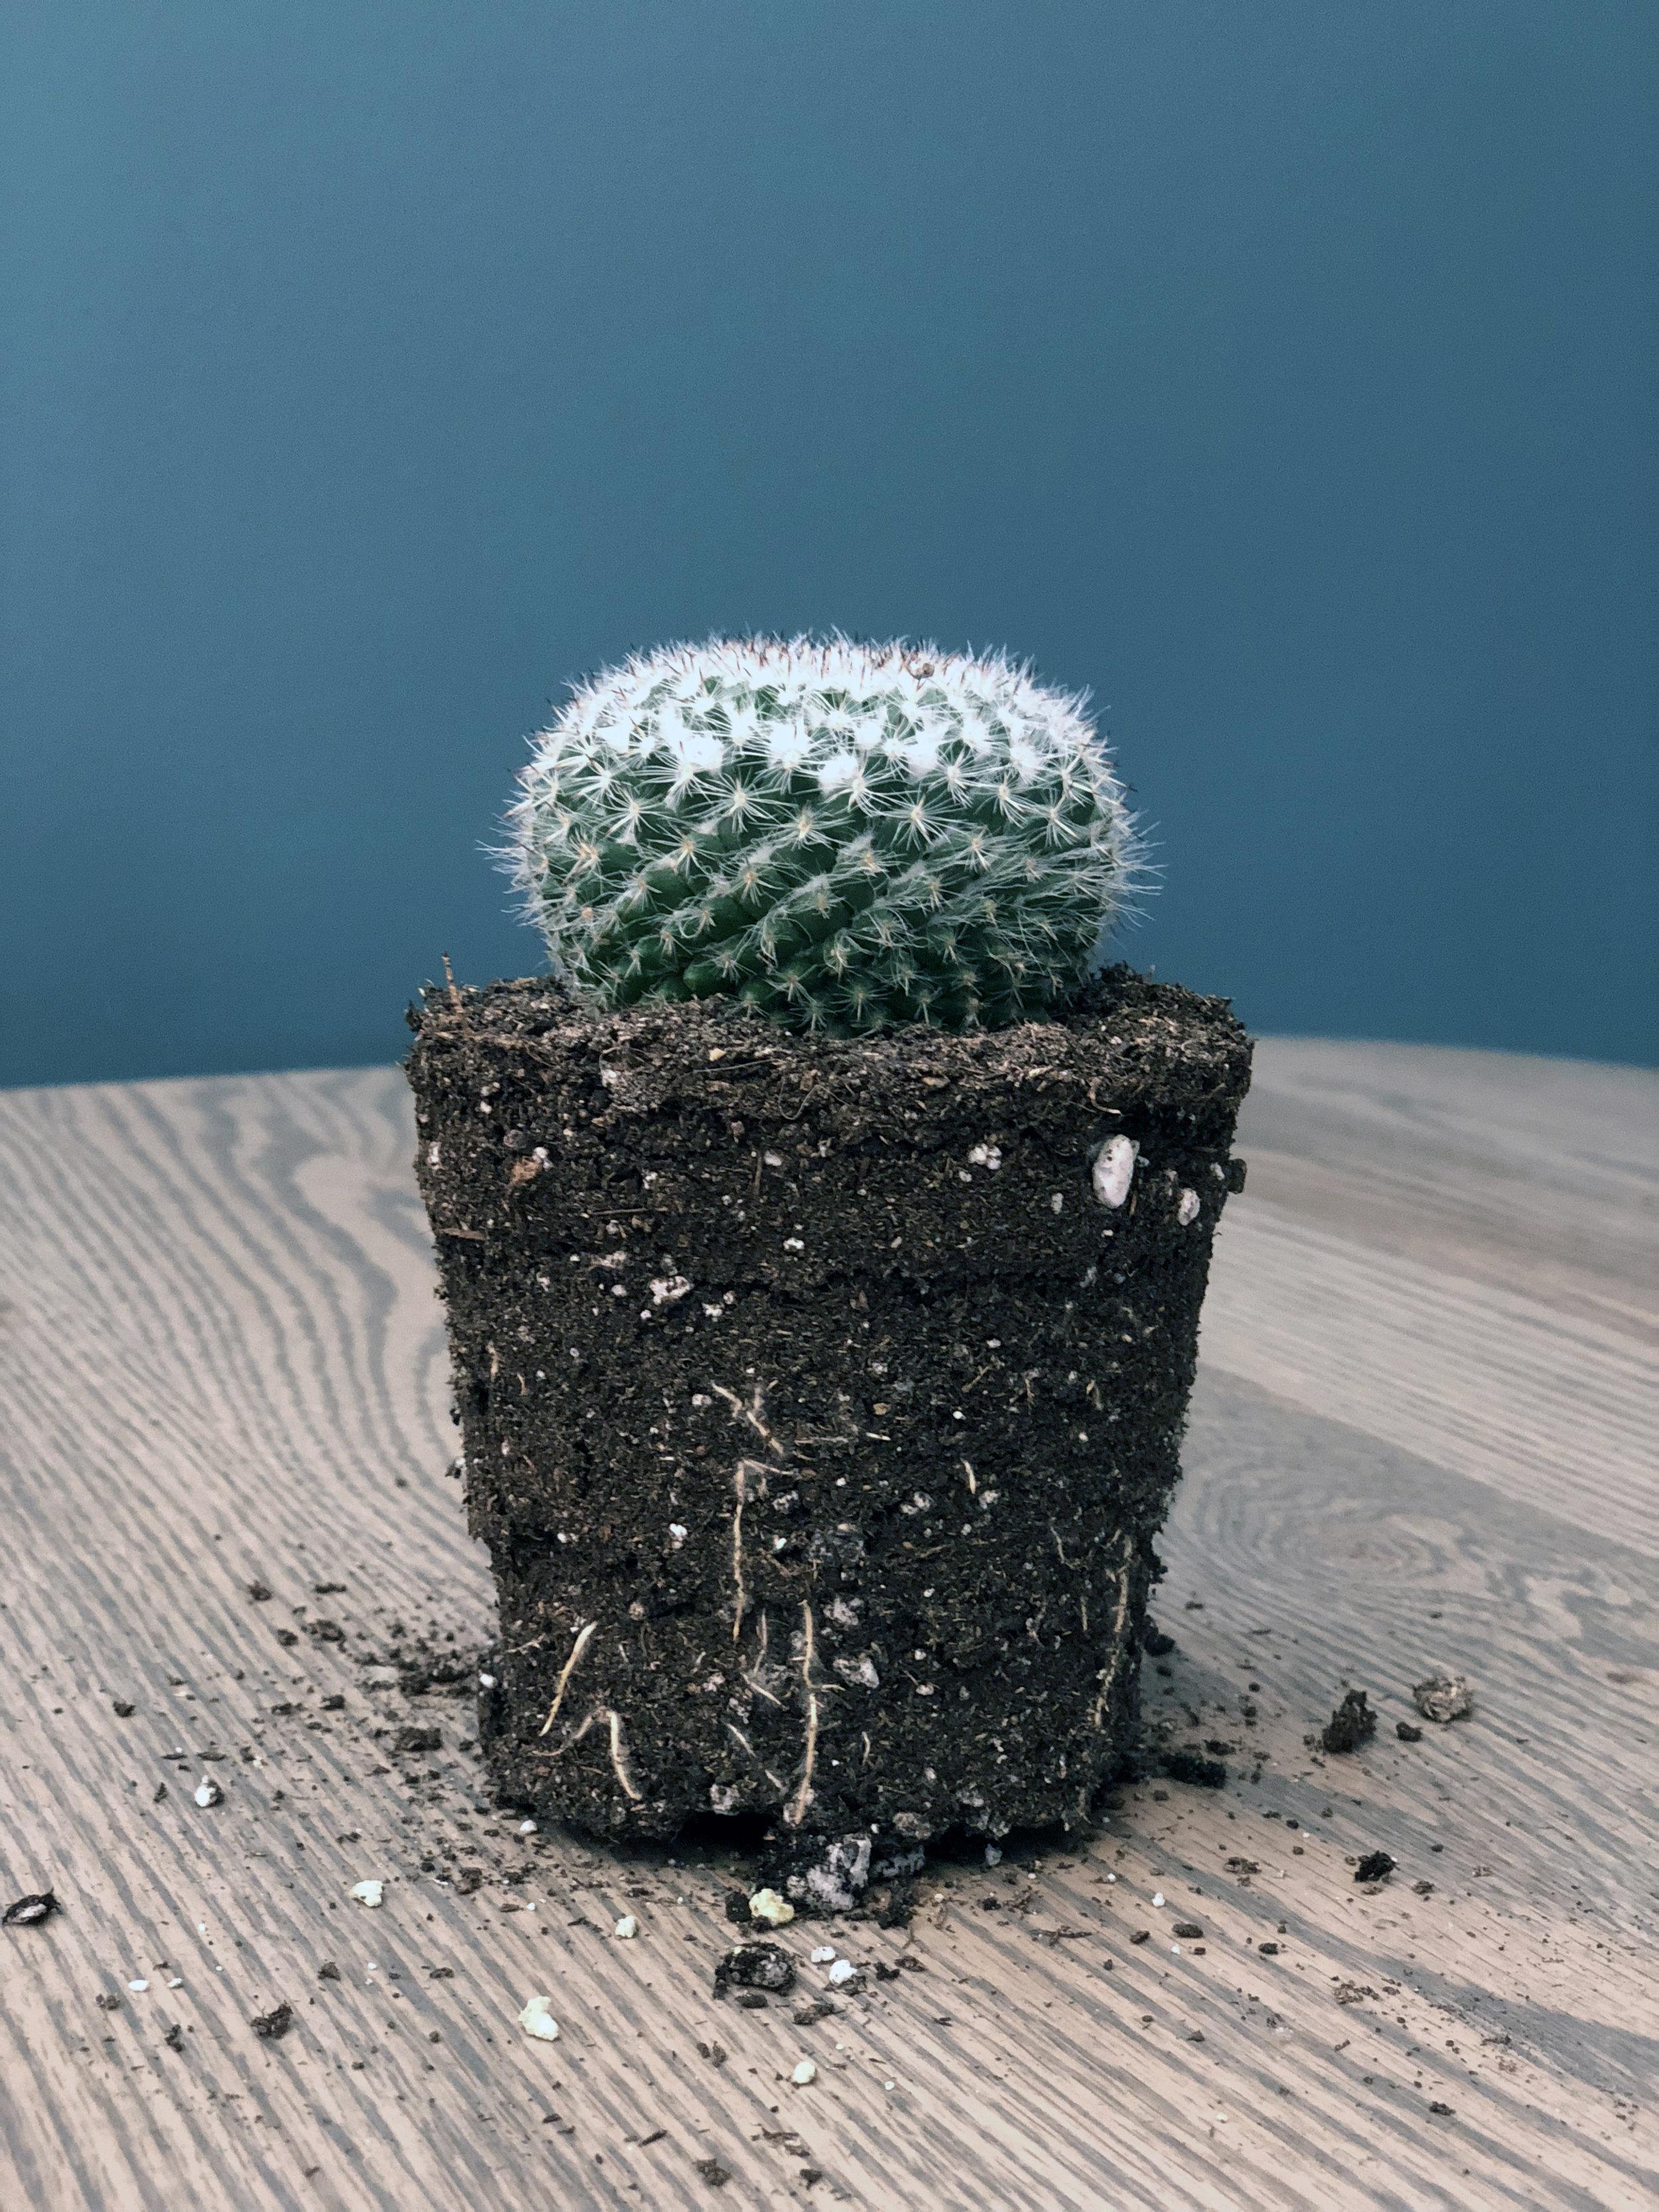 cactus3_edit - Copy.jpg